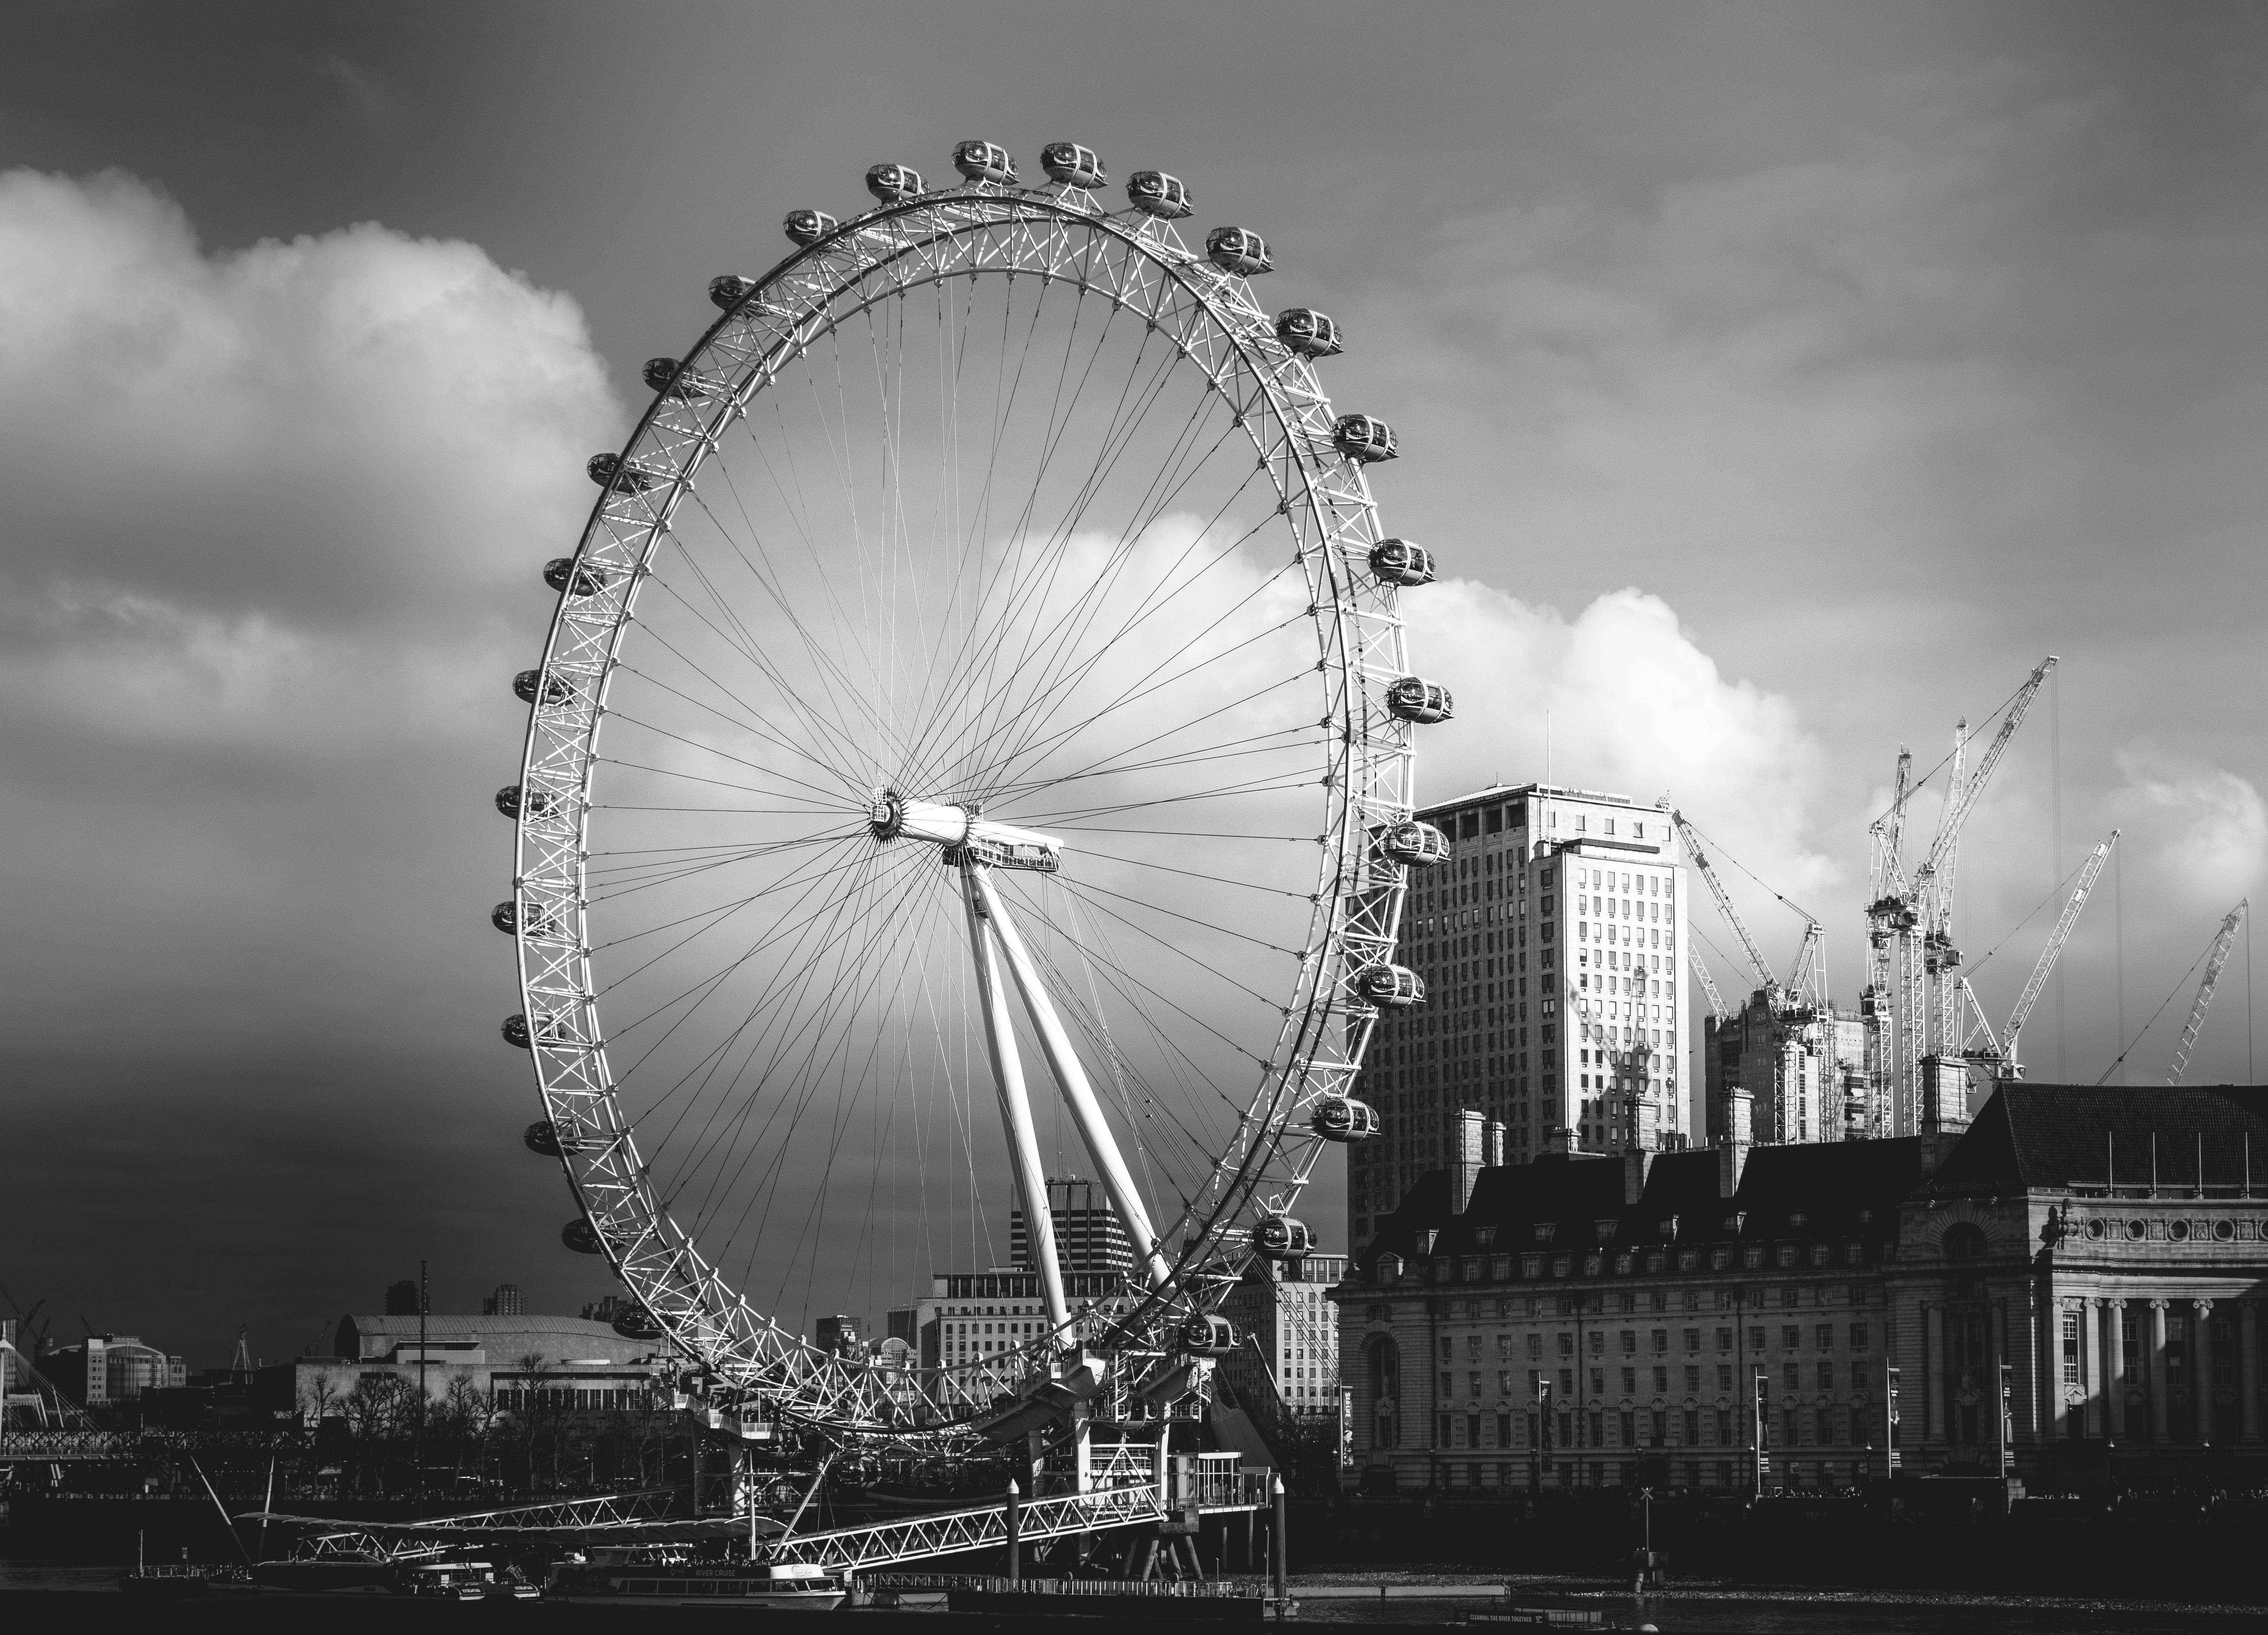 Wallpaper Ferris Wheel Landmark Sky Black And White Tourist Images, Photos, Reviews